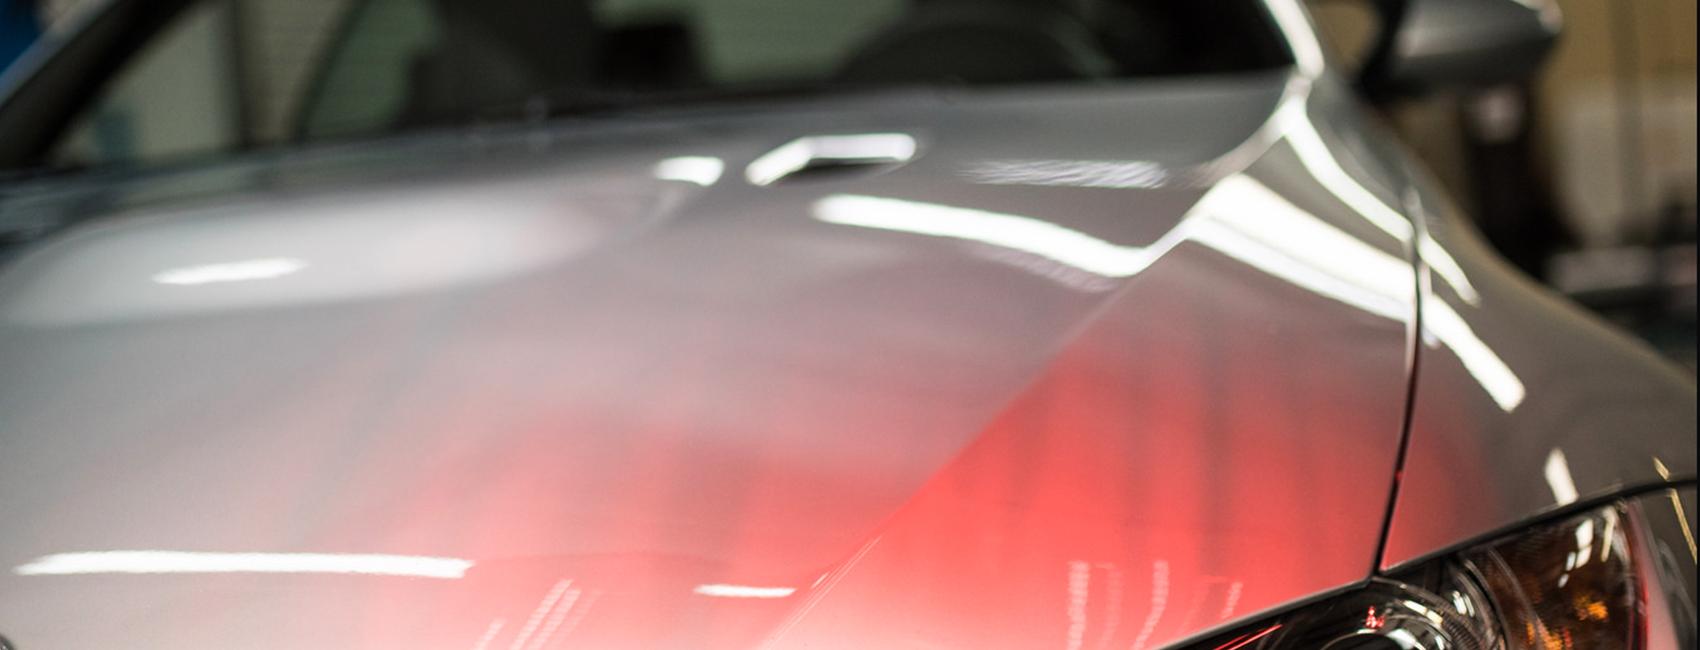 Detailed Designs Auto Spa Paint Correction slider